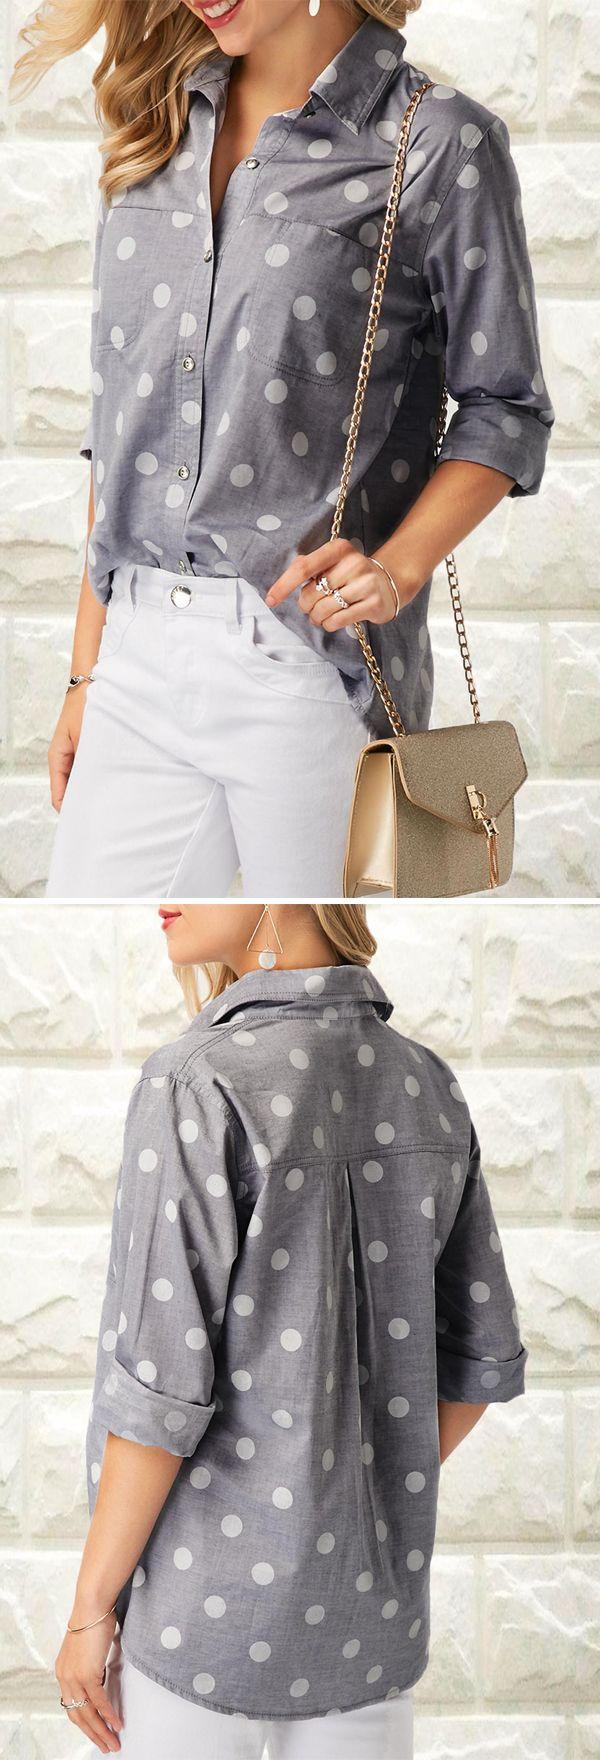 "Polka Dot Print Turndown Collar Shirt ""Adoring collars, buttons and polka dots"""